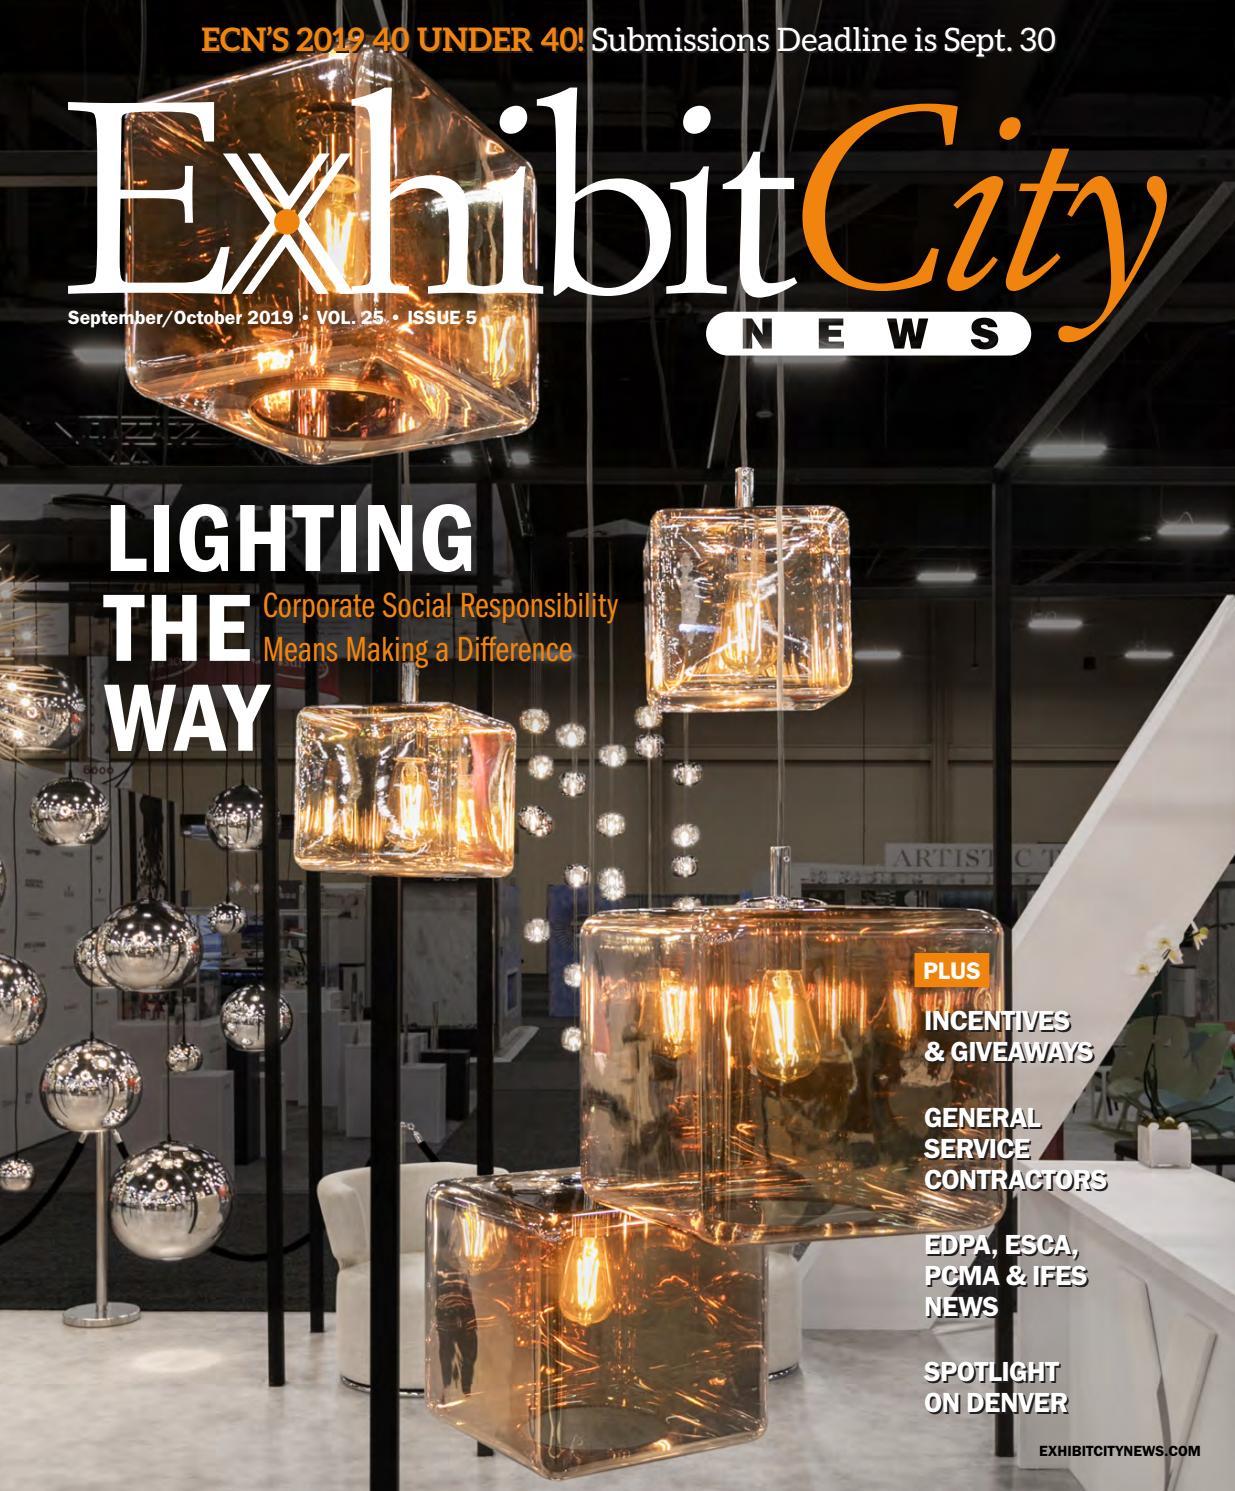 Exhibit City News - September/October 2019 by Exhibit City